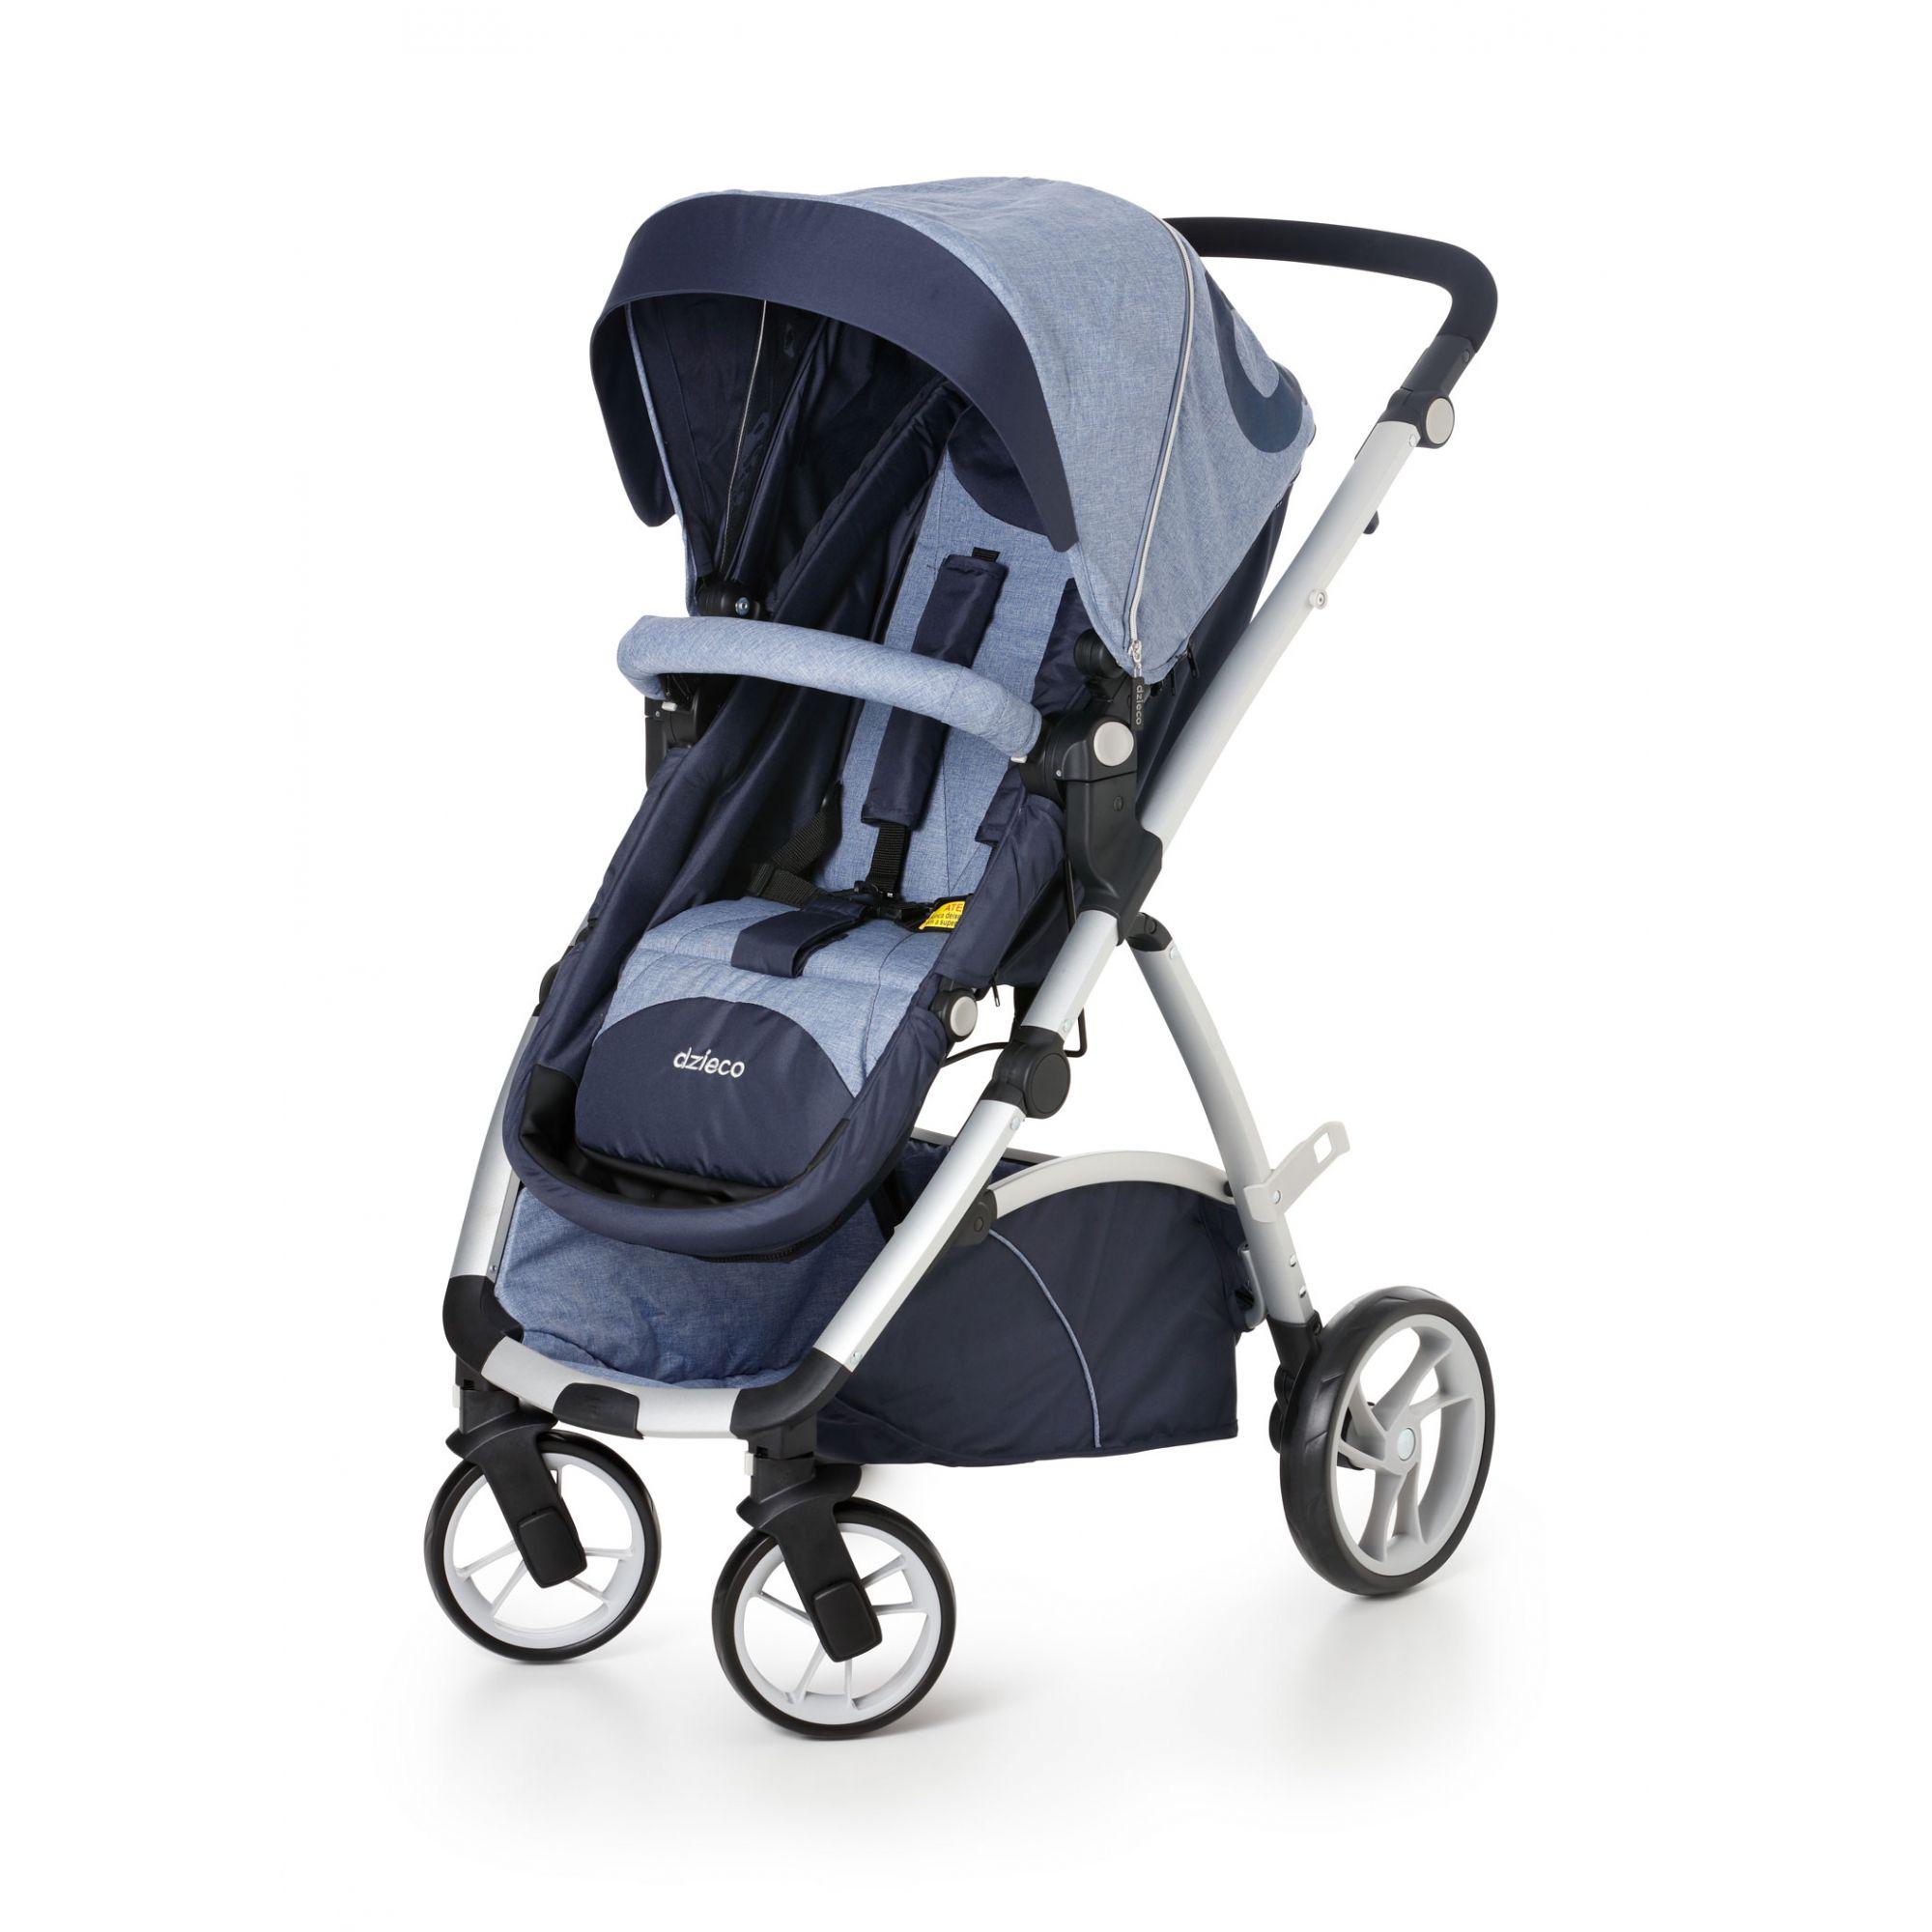 Carrinho Maly Azul - Dzieco Ref D102